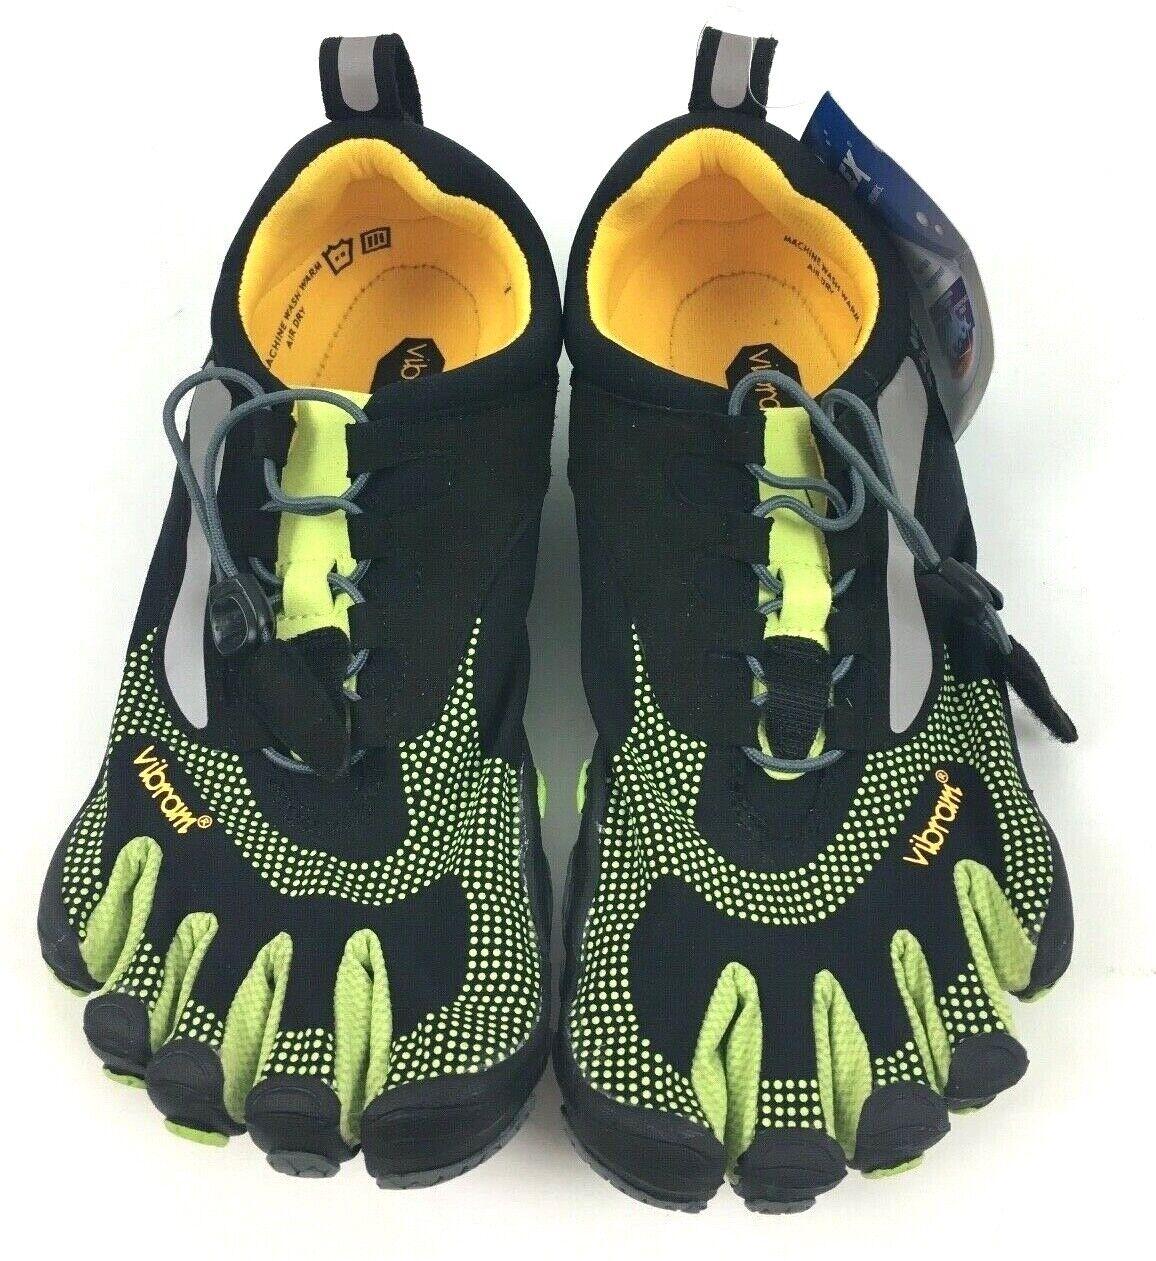 Vibram FiveFingers Bikala M3581 Outdoor shoes Green Black Mens Size 40